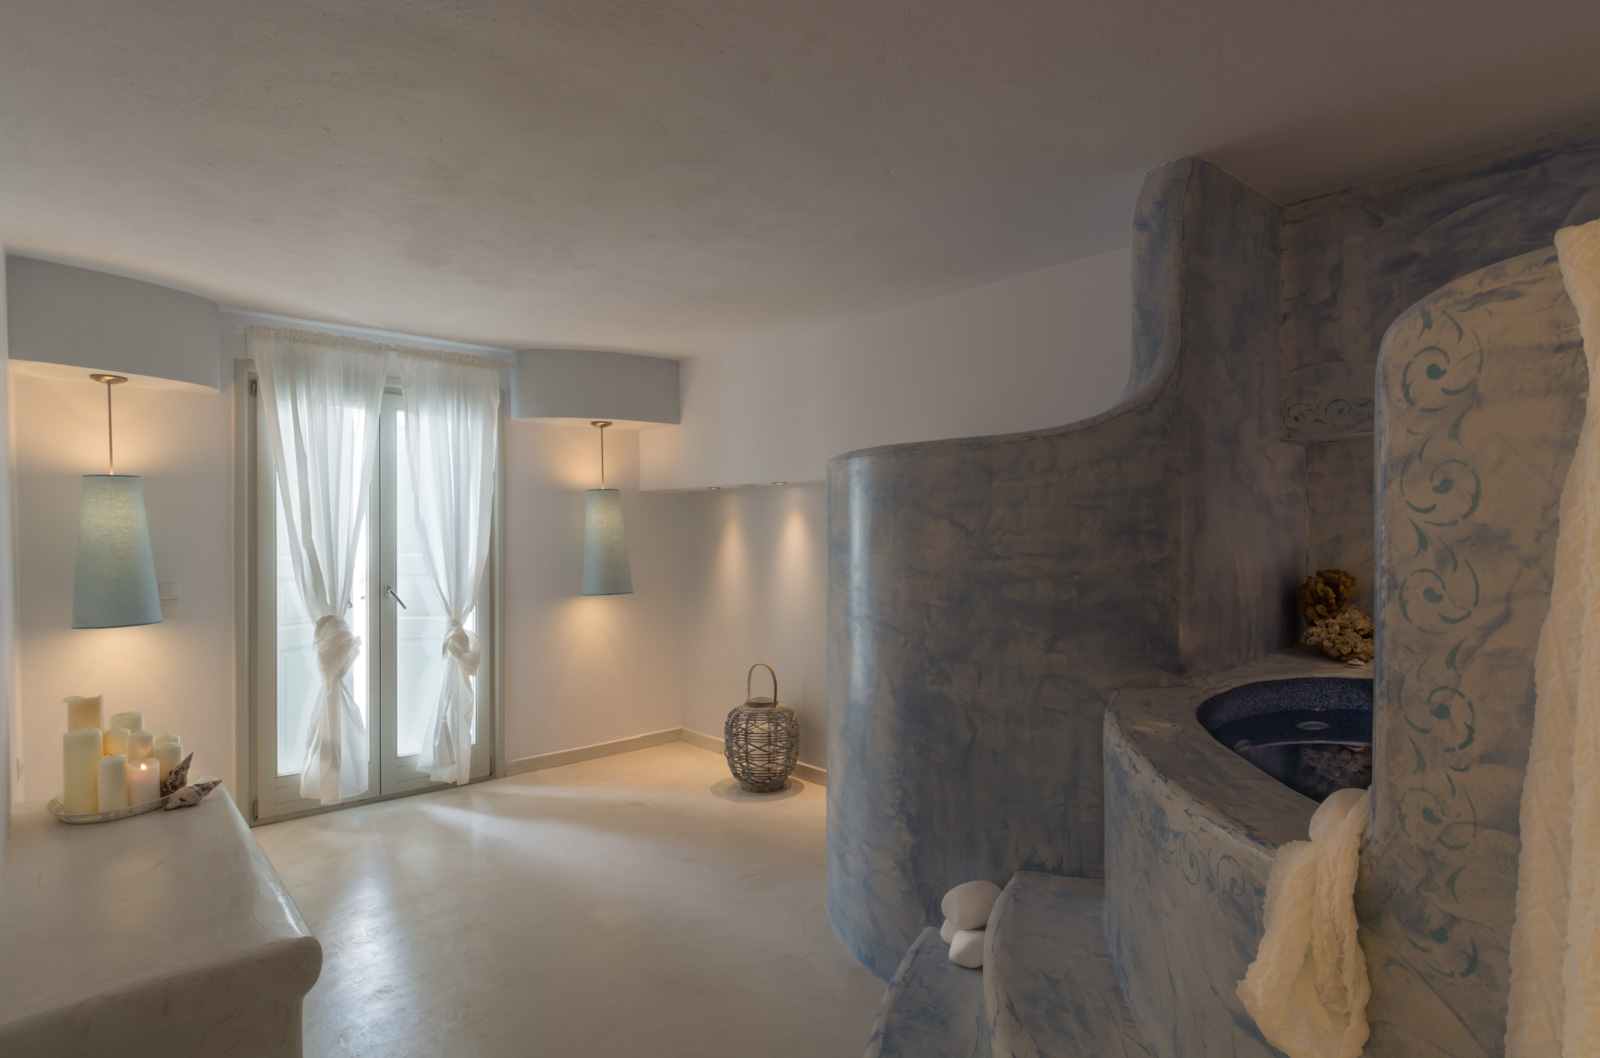 santorini villas 5 bedrooms spa